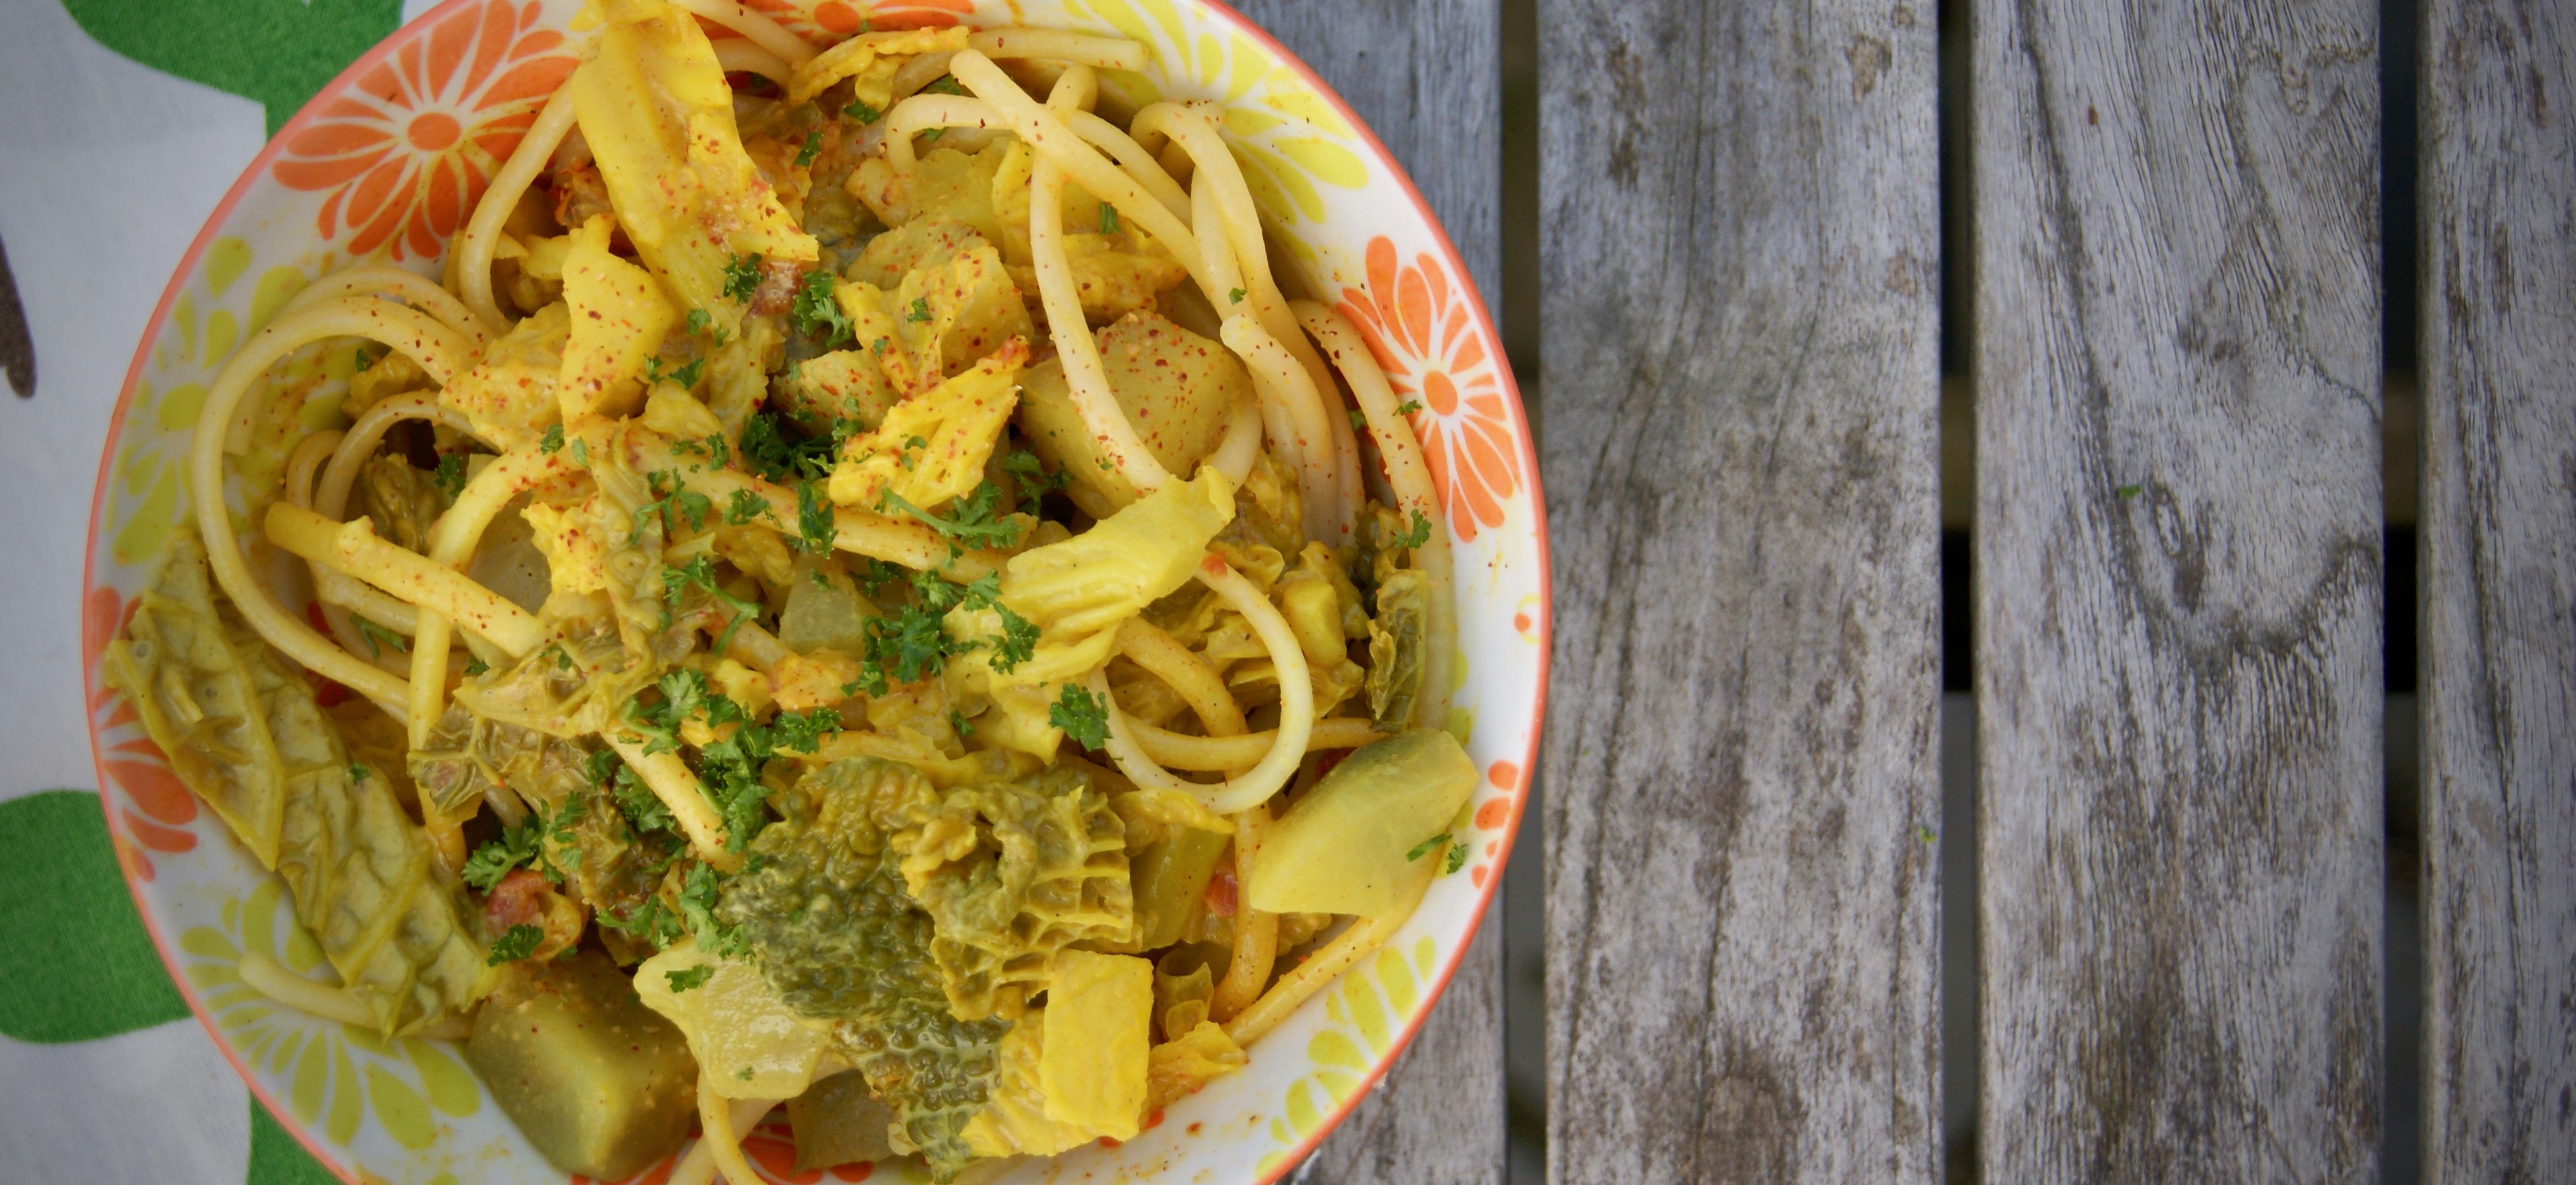 Recept: pasta met groene kool en yacon